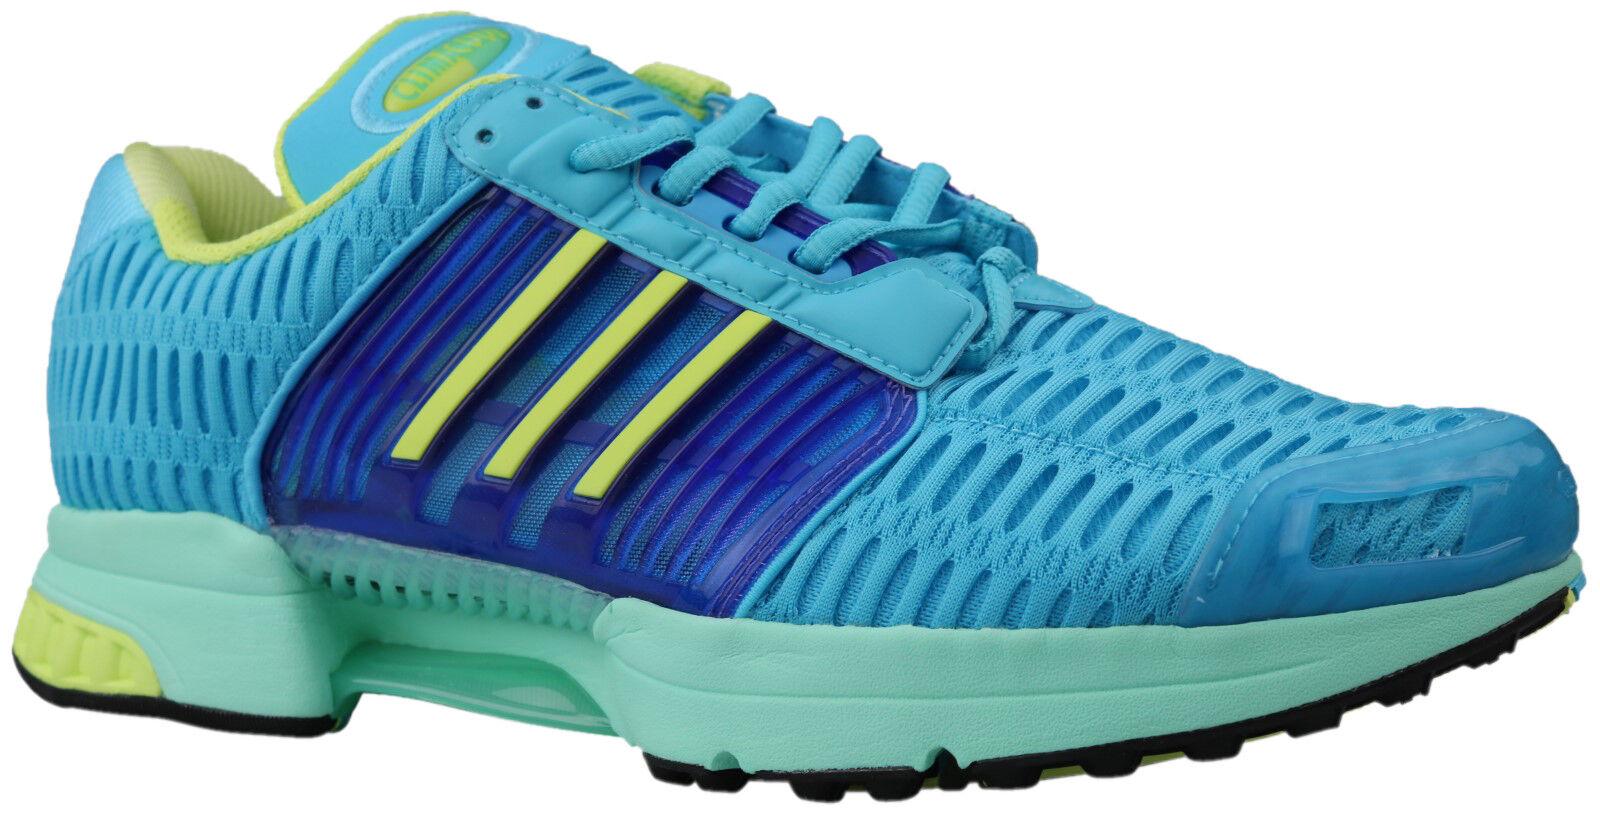 Adidas Climacool Climacool Climacool 1 Turnschuhe Laufschuhe blau aqua BA7157 Gr. 36 - 44,5 NEU & OVP 7d77a8